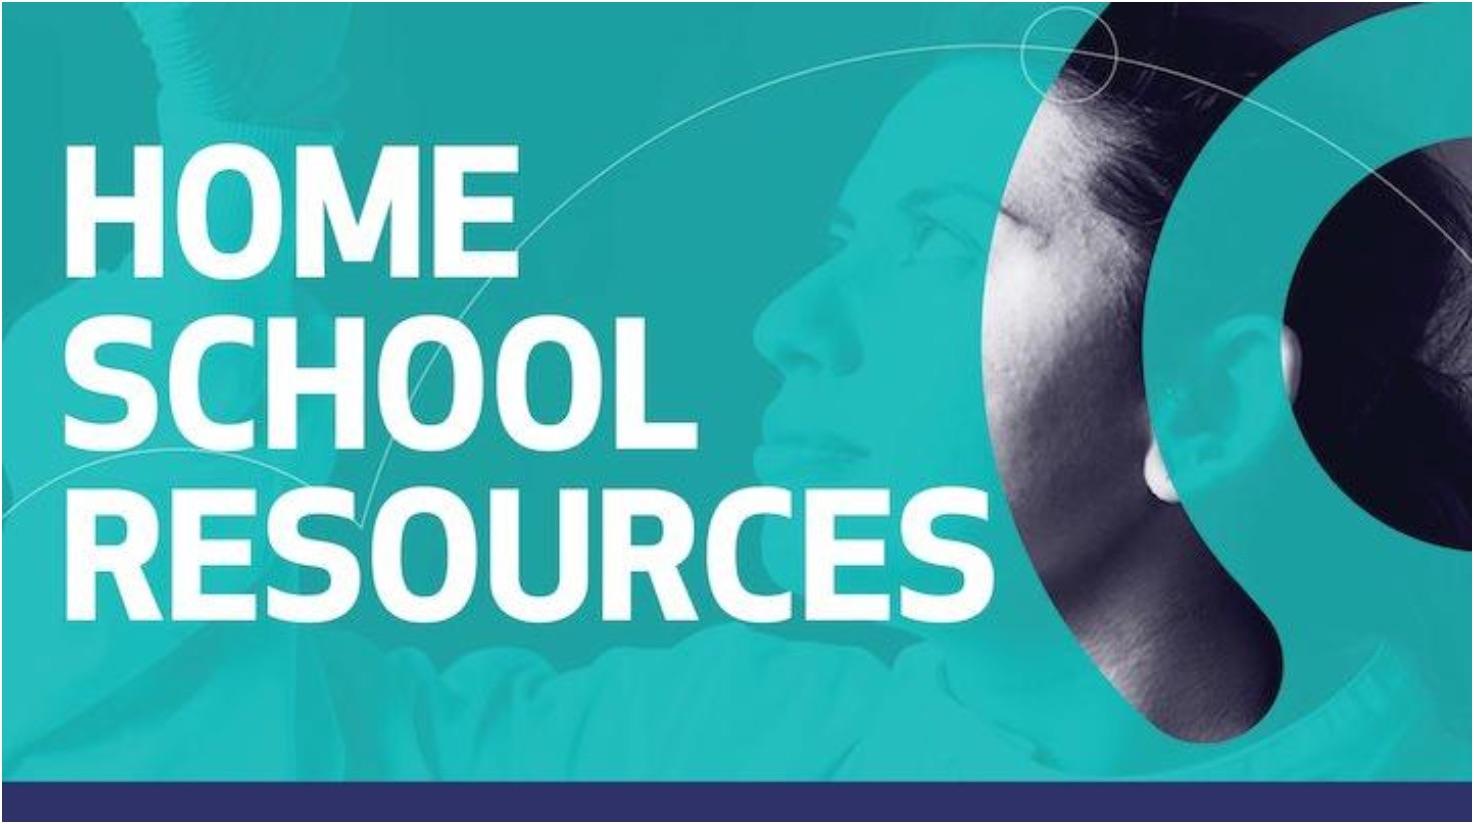 CÚRAM Offers Online Teaching Support in STEM for Primary Teachers